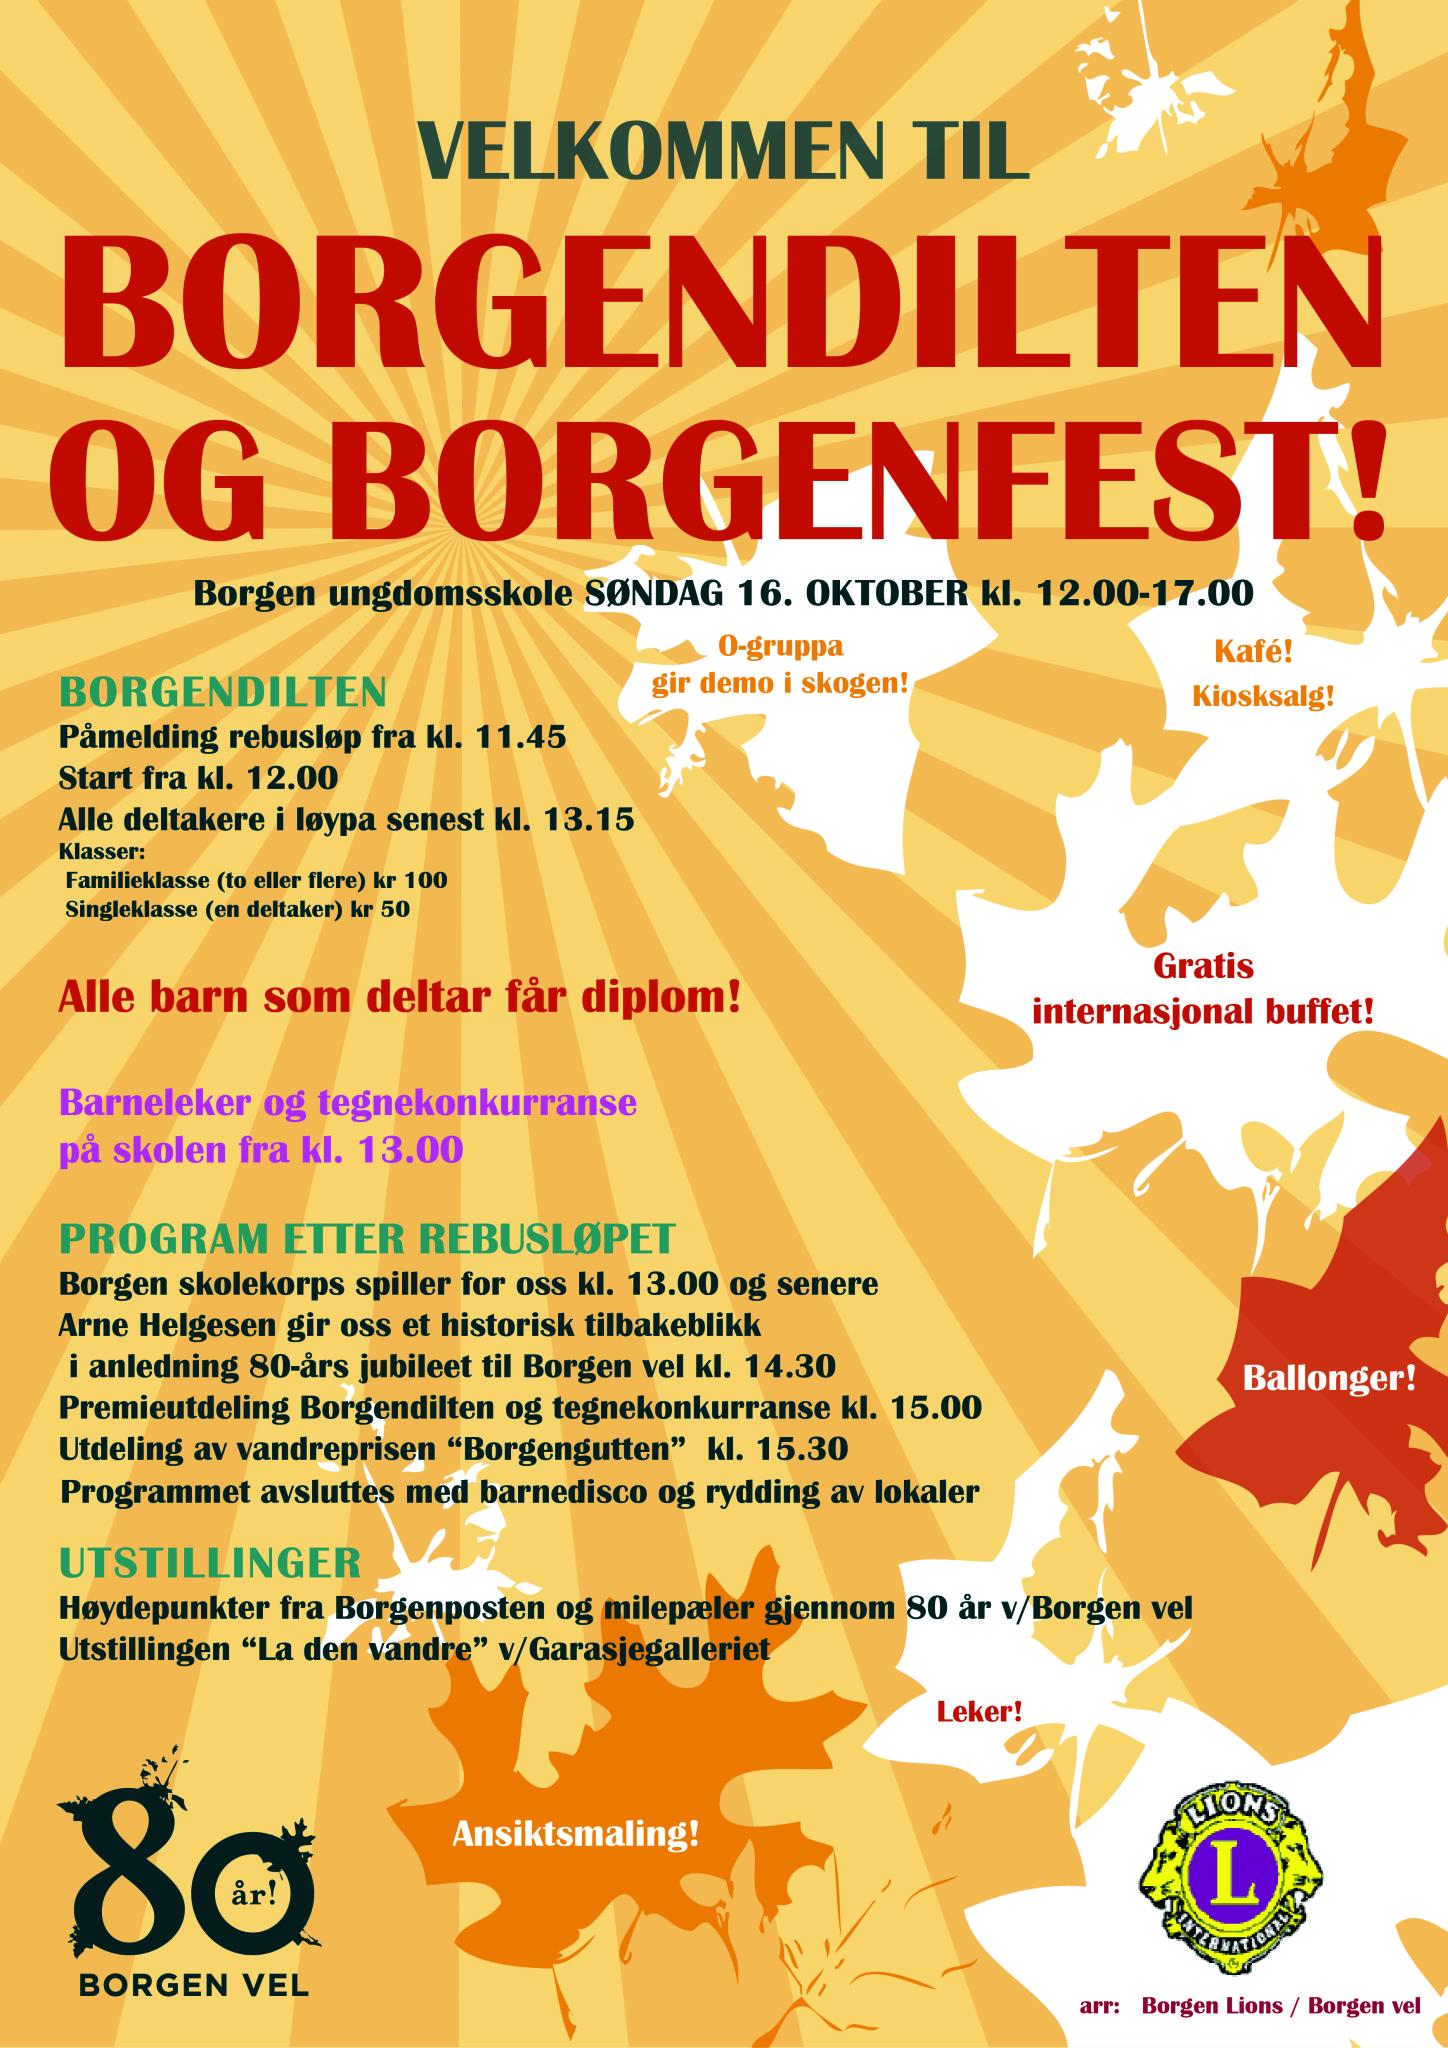 plakat_borgendilten-borgenfest